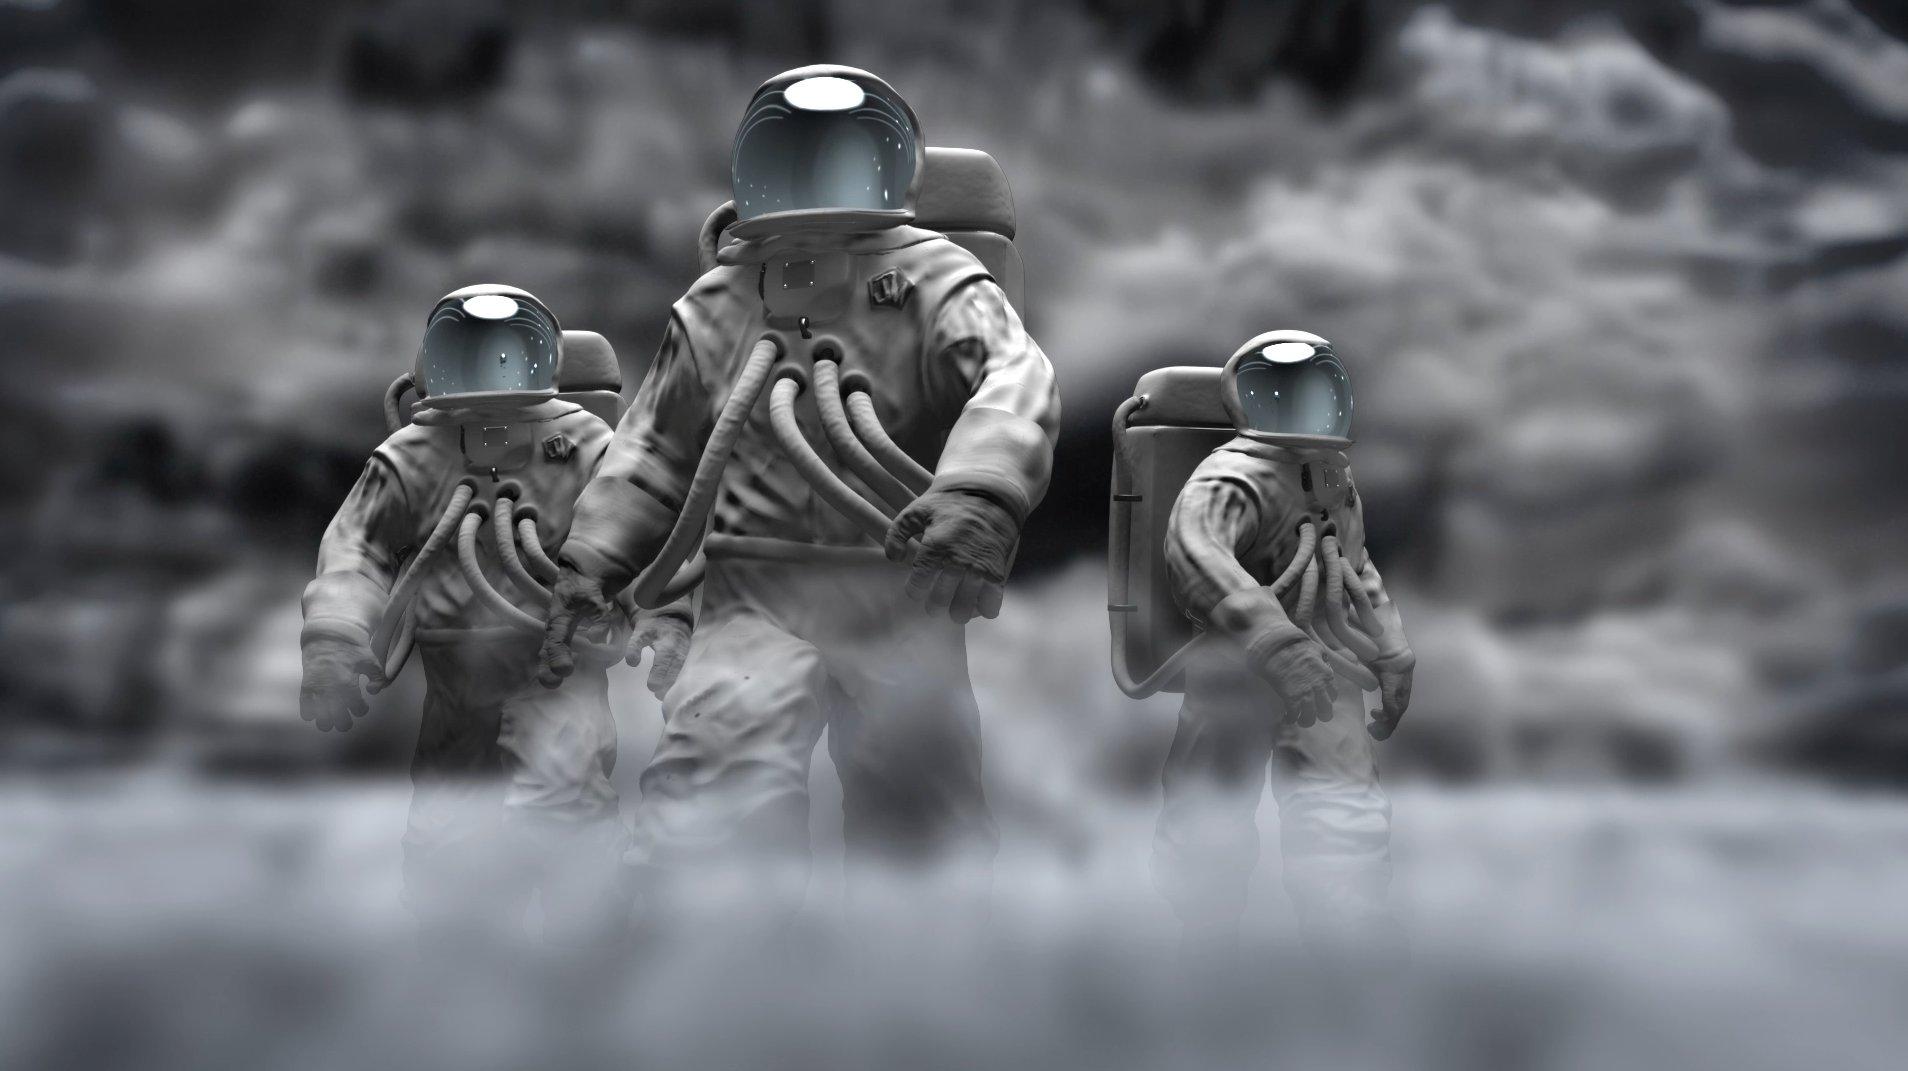 Steve Patterson - Launchpad Astronauts